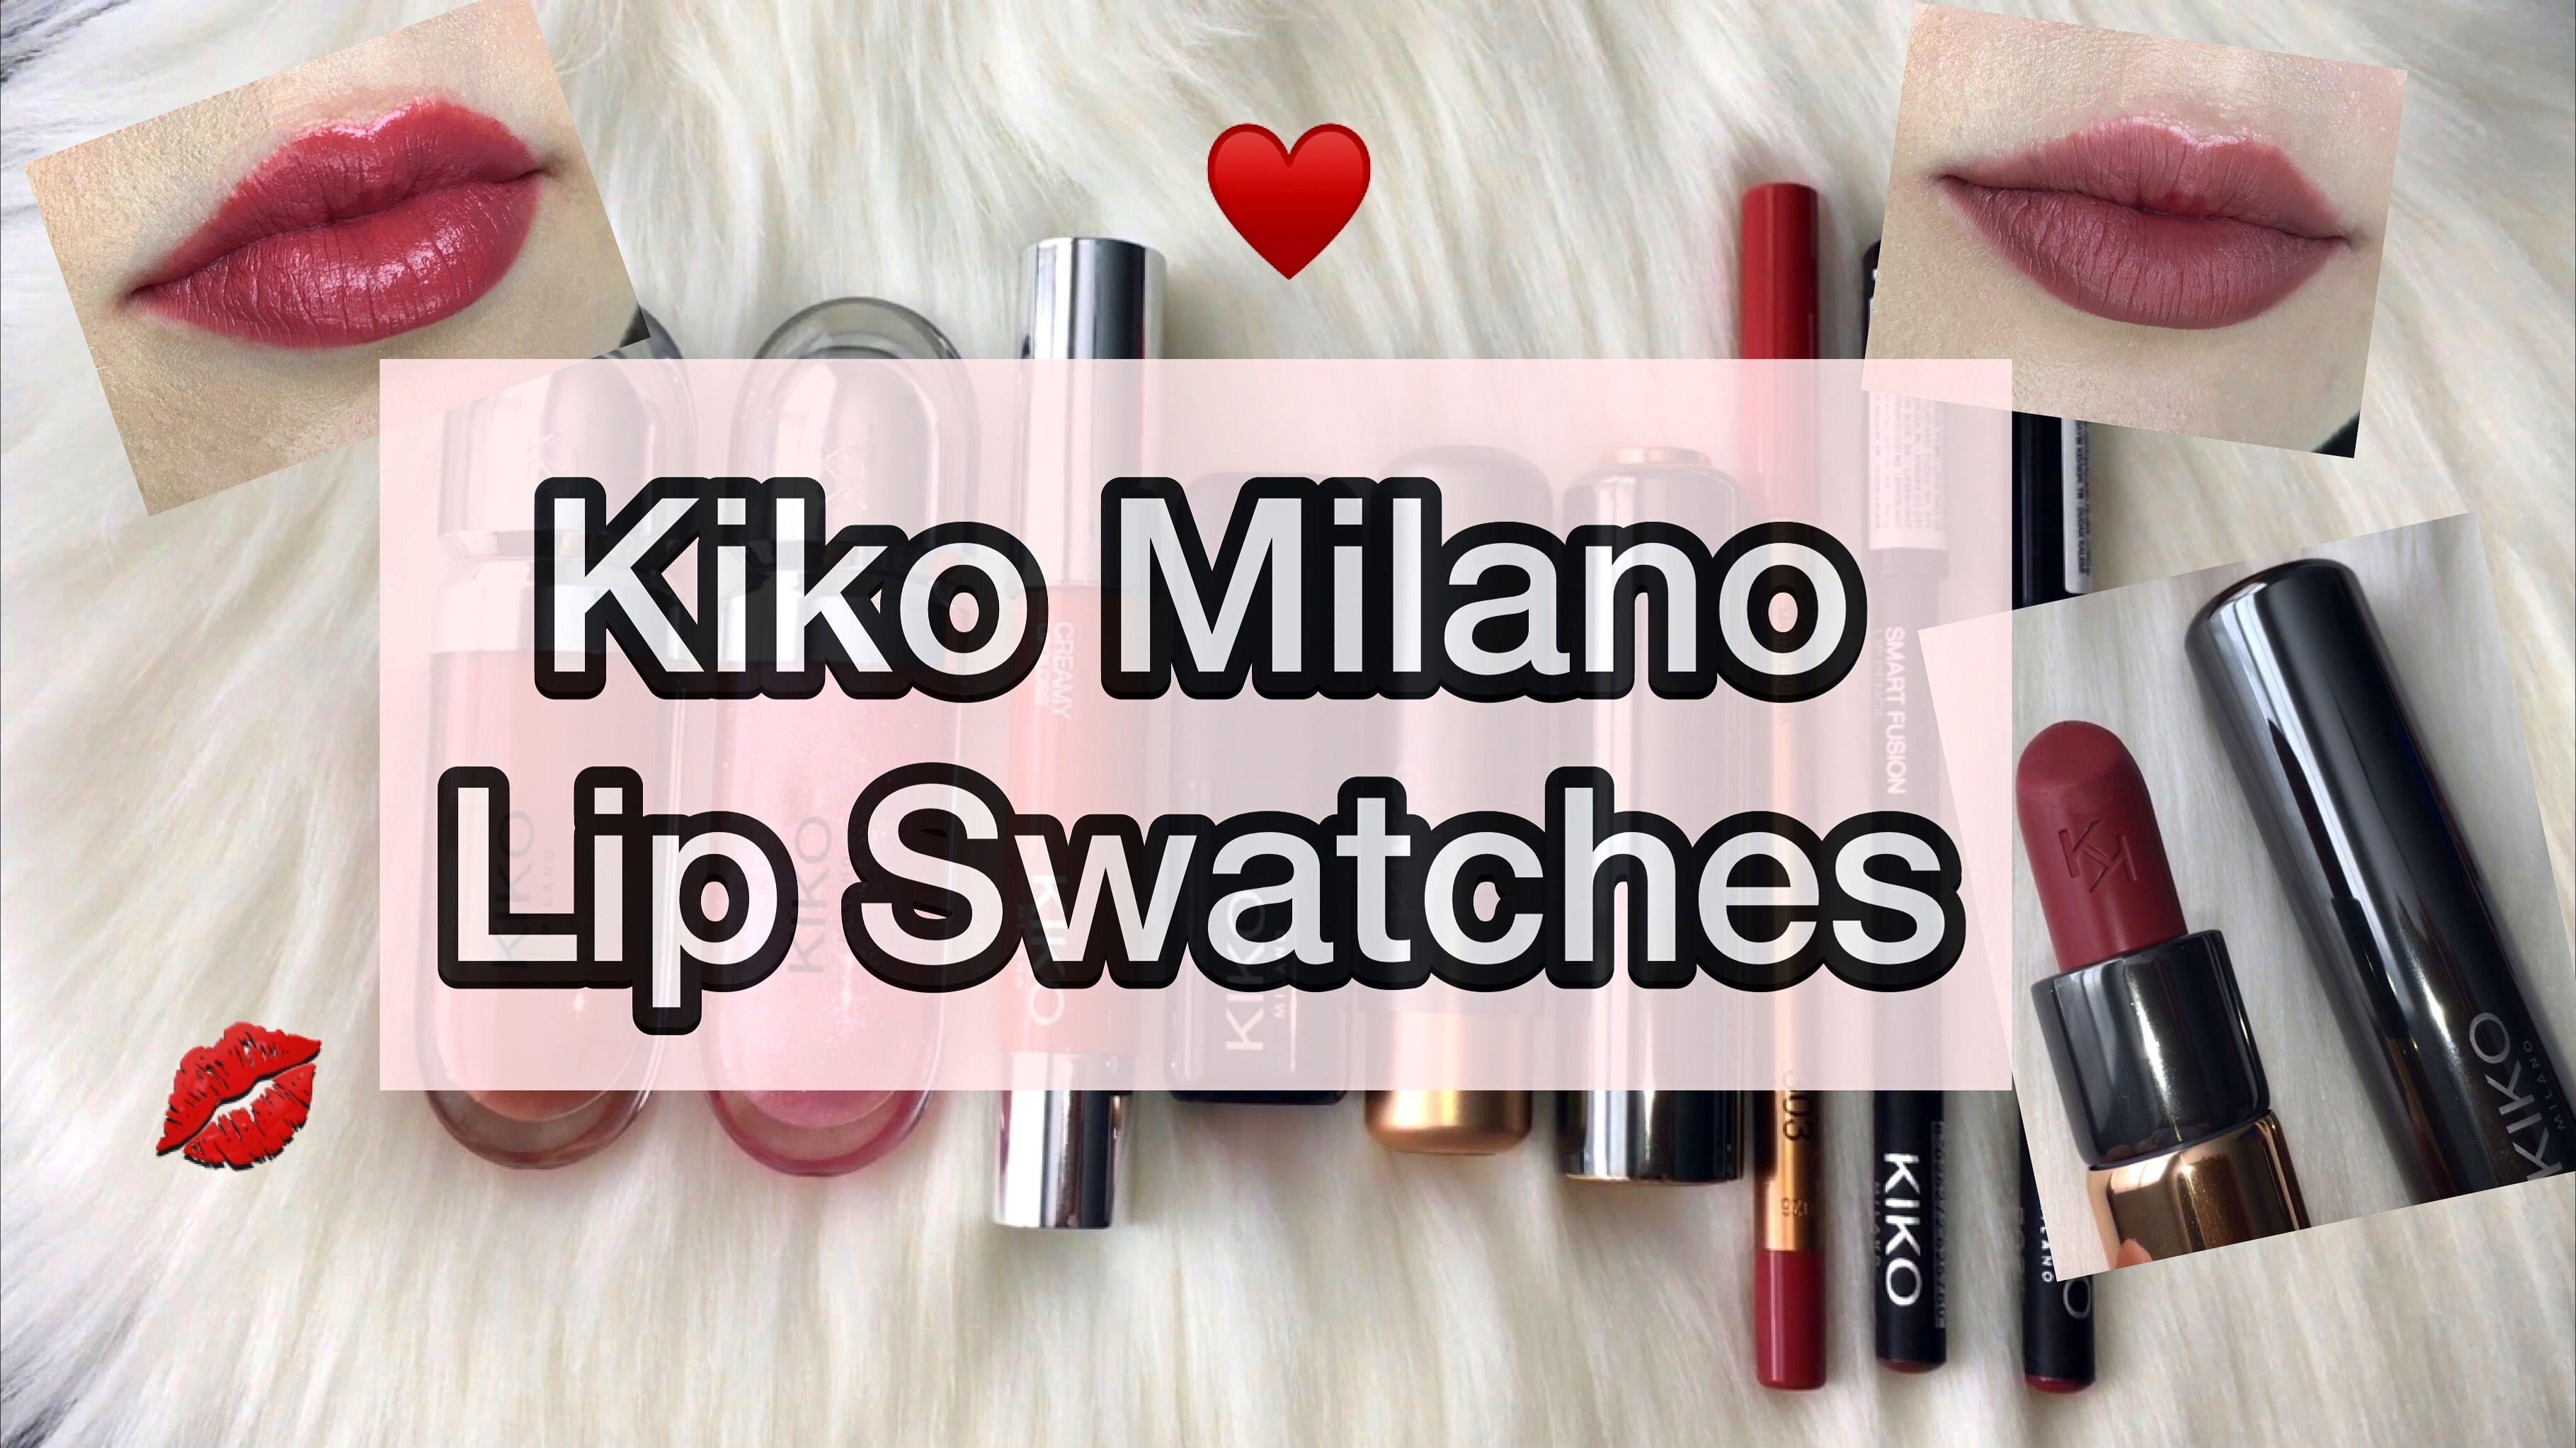 Kiko Milano Lip Swatches Kiko Milano Lip Swatches Kiko